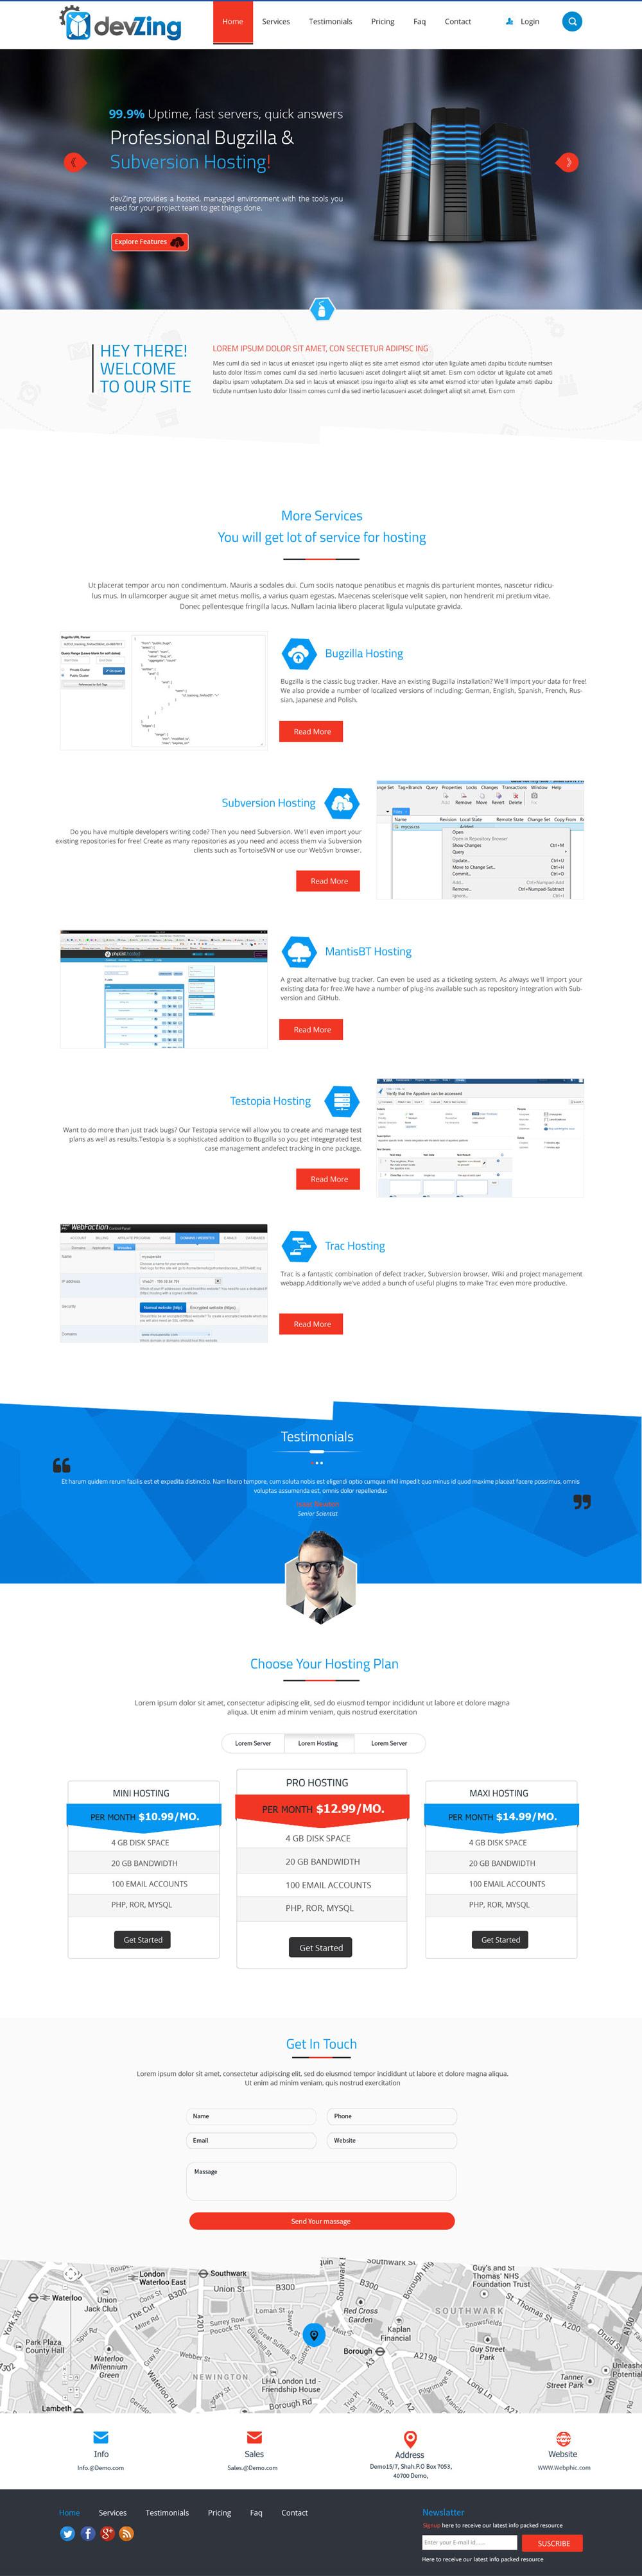 devZing Home page logo design